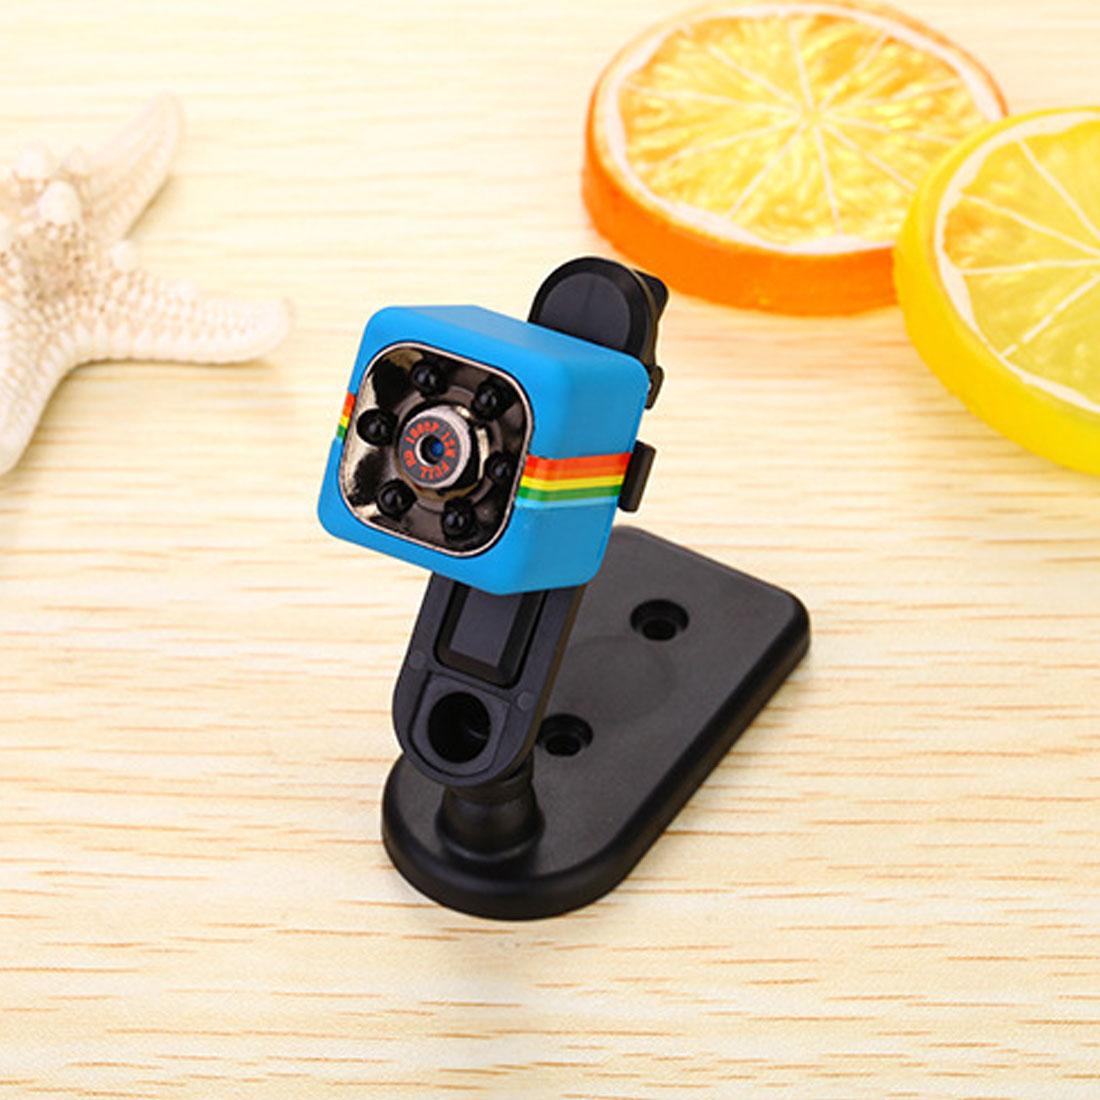 SQ11 Mini Kamera HD 1080 p Auto DVR Nachtsicht Camcorder Infrarot Video Recorder Sport Digital Kamera Unterstützung TF Karte